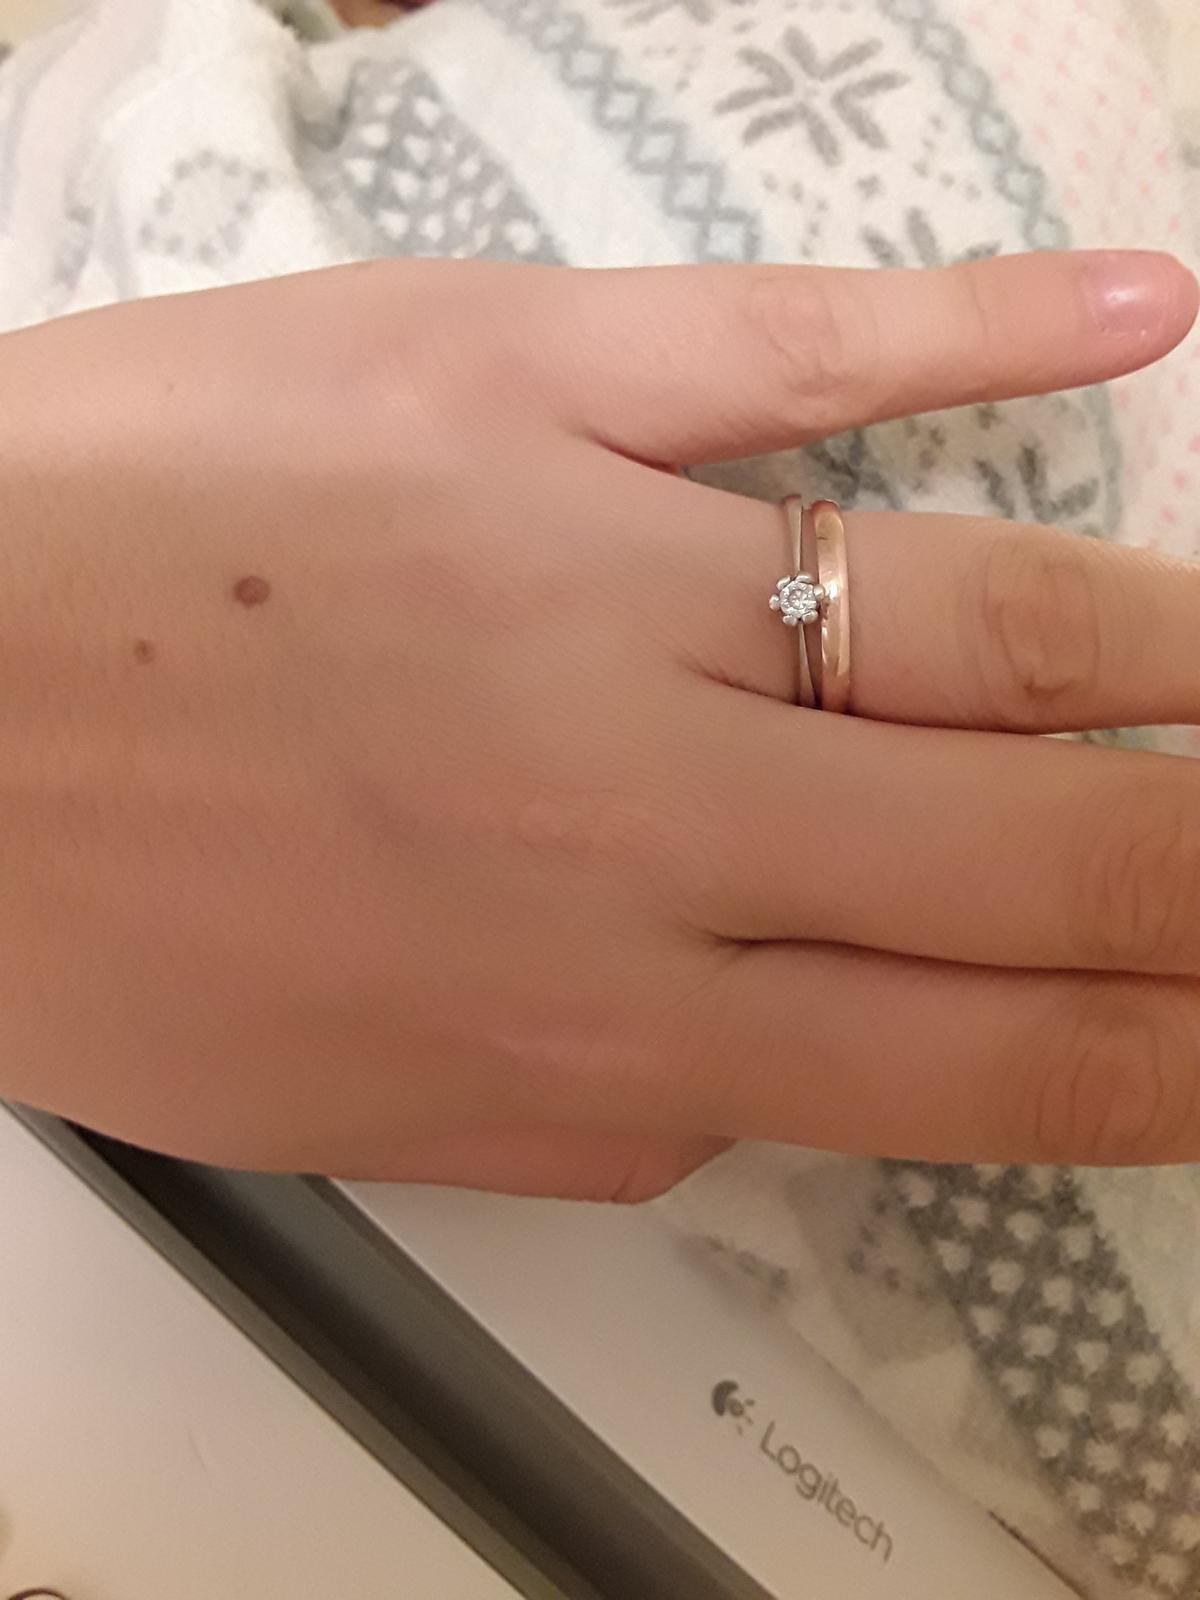 Snubni A Zasnubn Prsten Jak Nosit Svatebni P